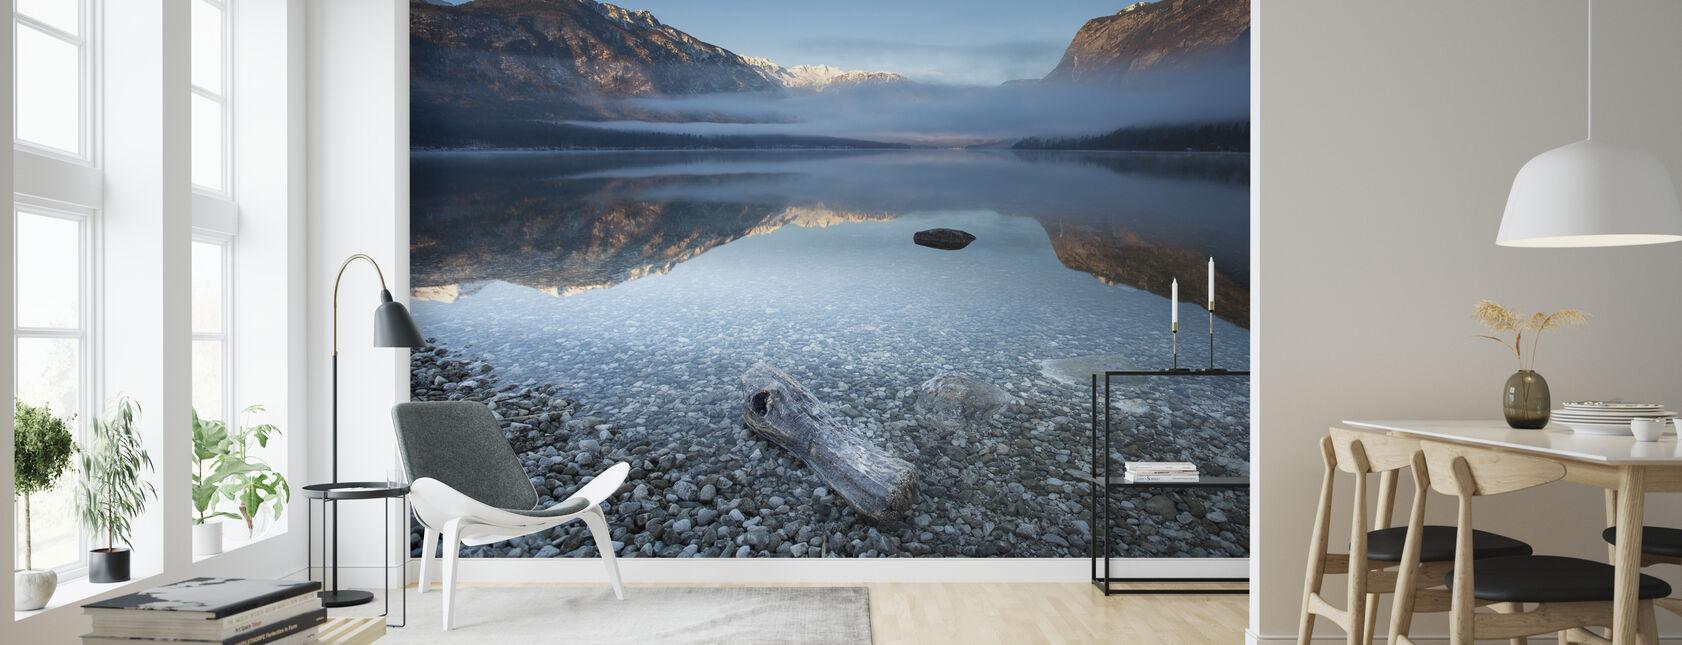 Bohinj's Tranquility - Wallpaper - Living Room